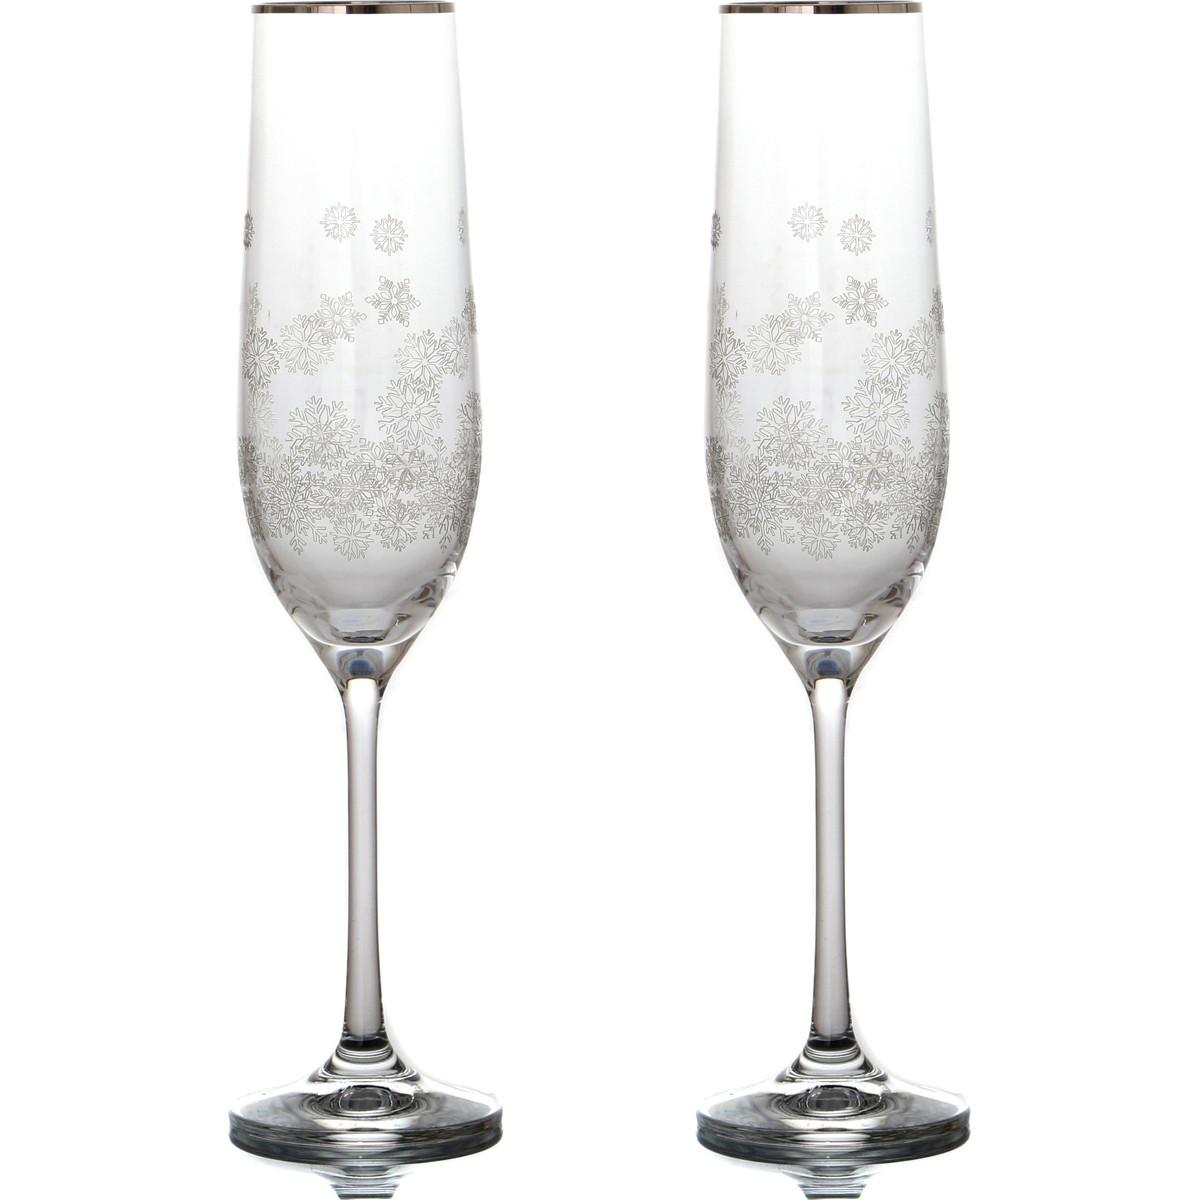 {} Bohemia Crystal Набор бокалов для шампанского Tansy  (24 см - 2 шт) crystal bohemia